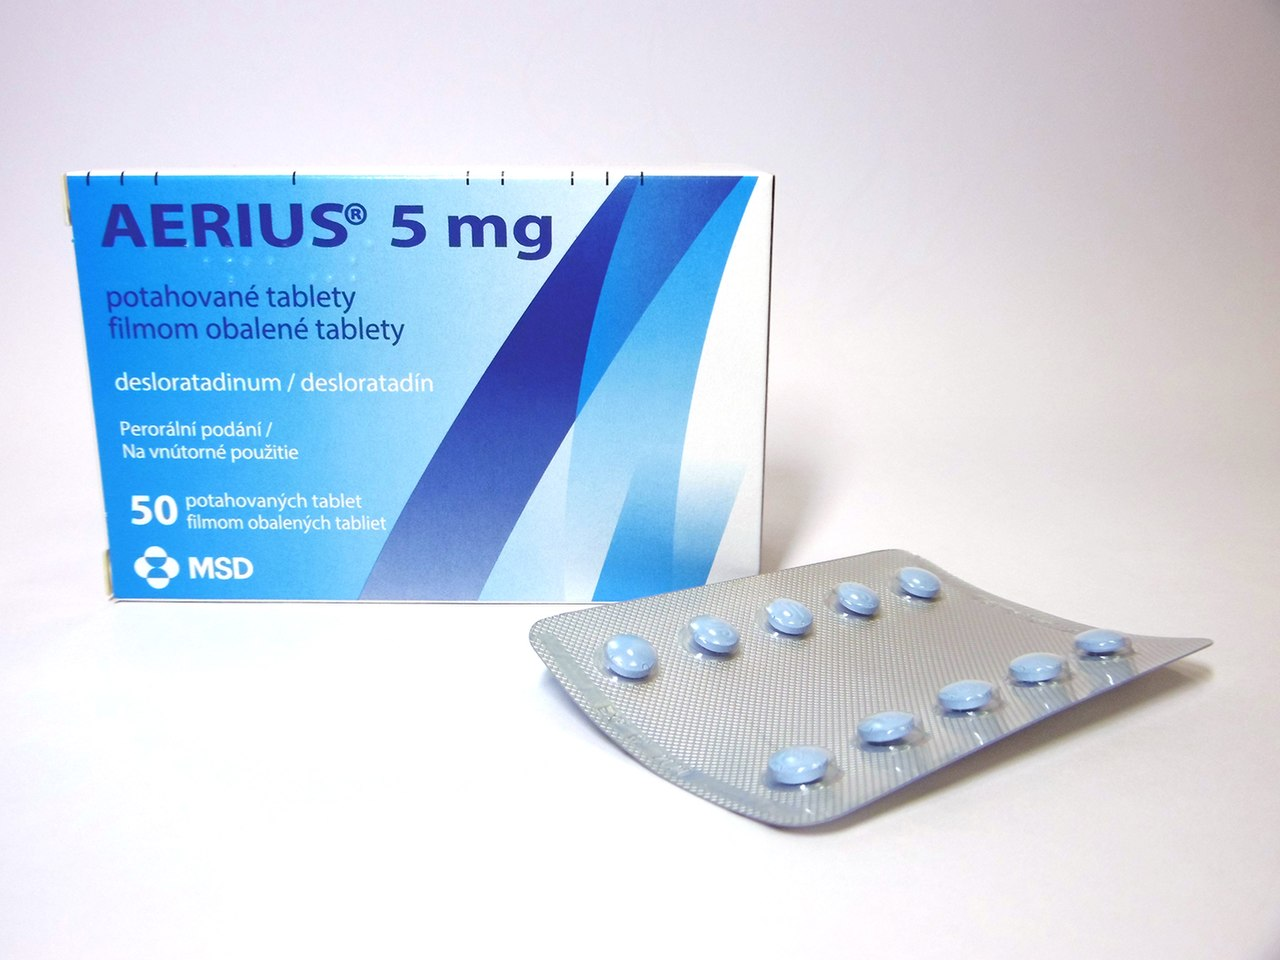 دواء aerius ايريوس